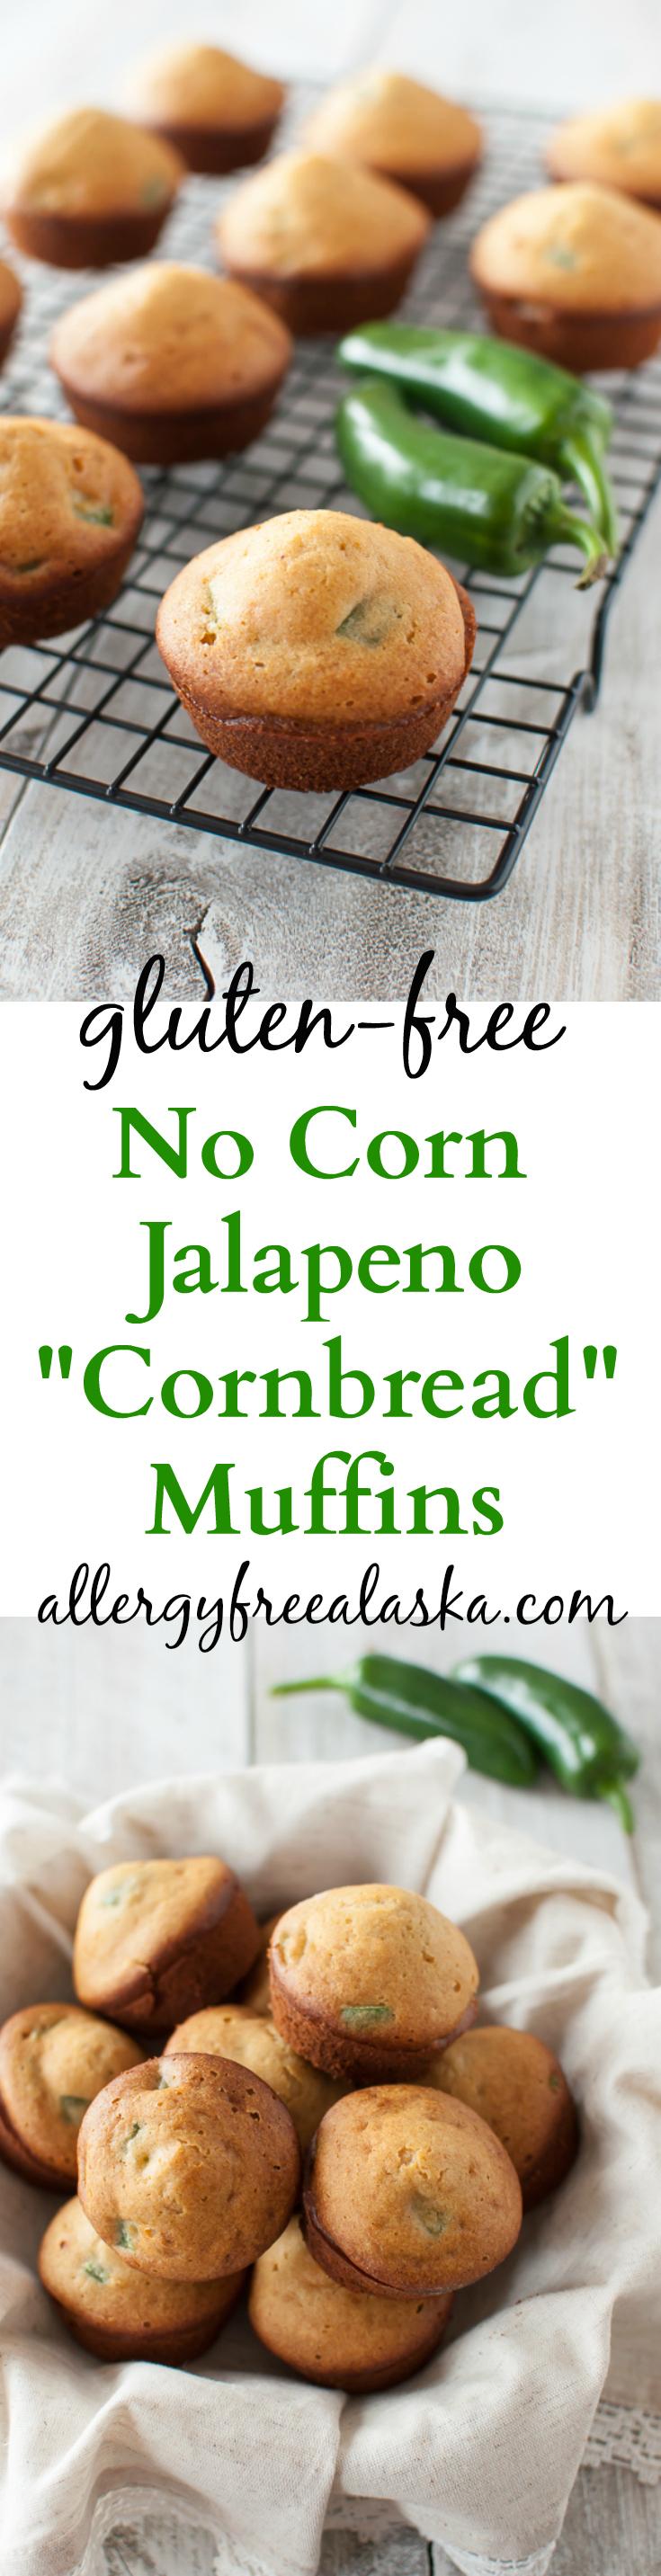 Gluten-Free No Corn Jalapeno %22Cornbread%22 Muffins Recipe from Allergy Free Alaska